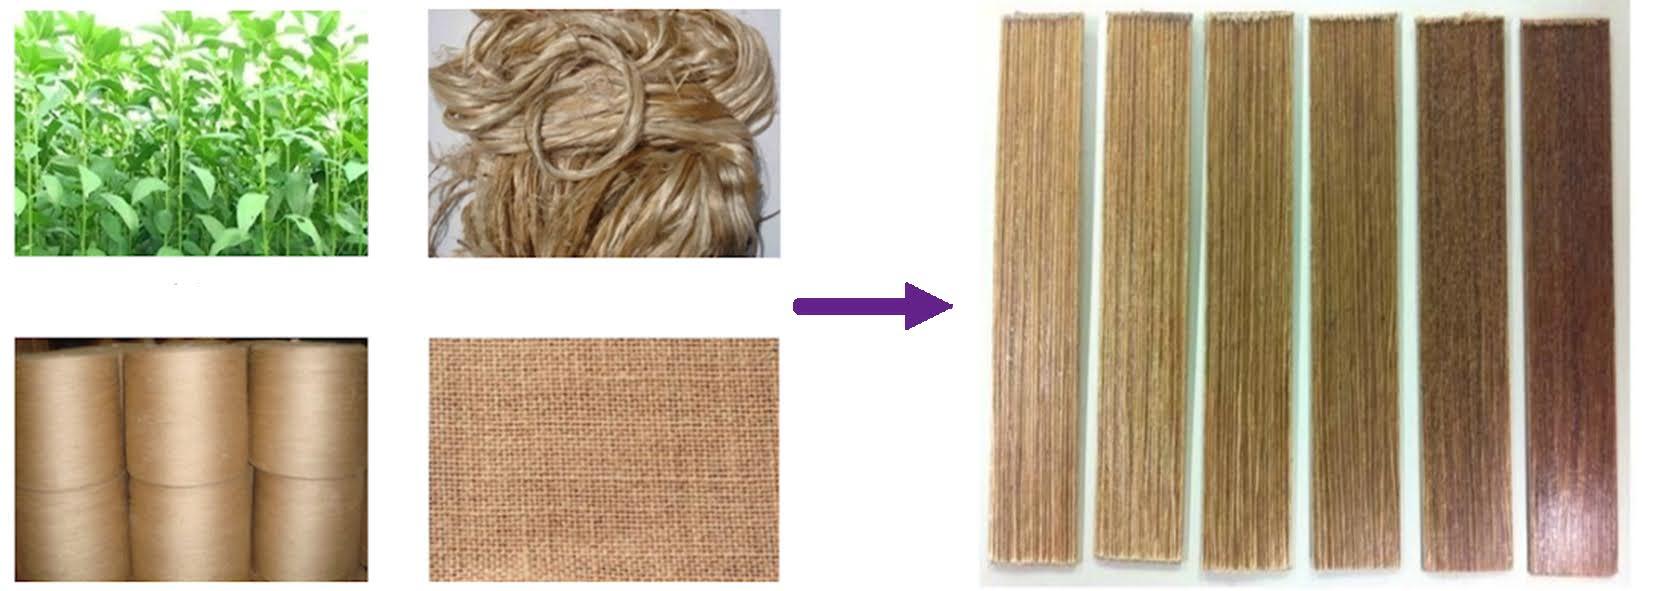 Jute fibre biocomposite